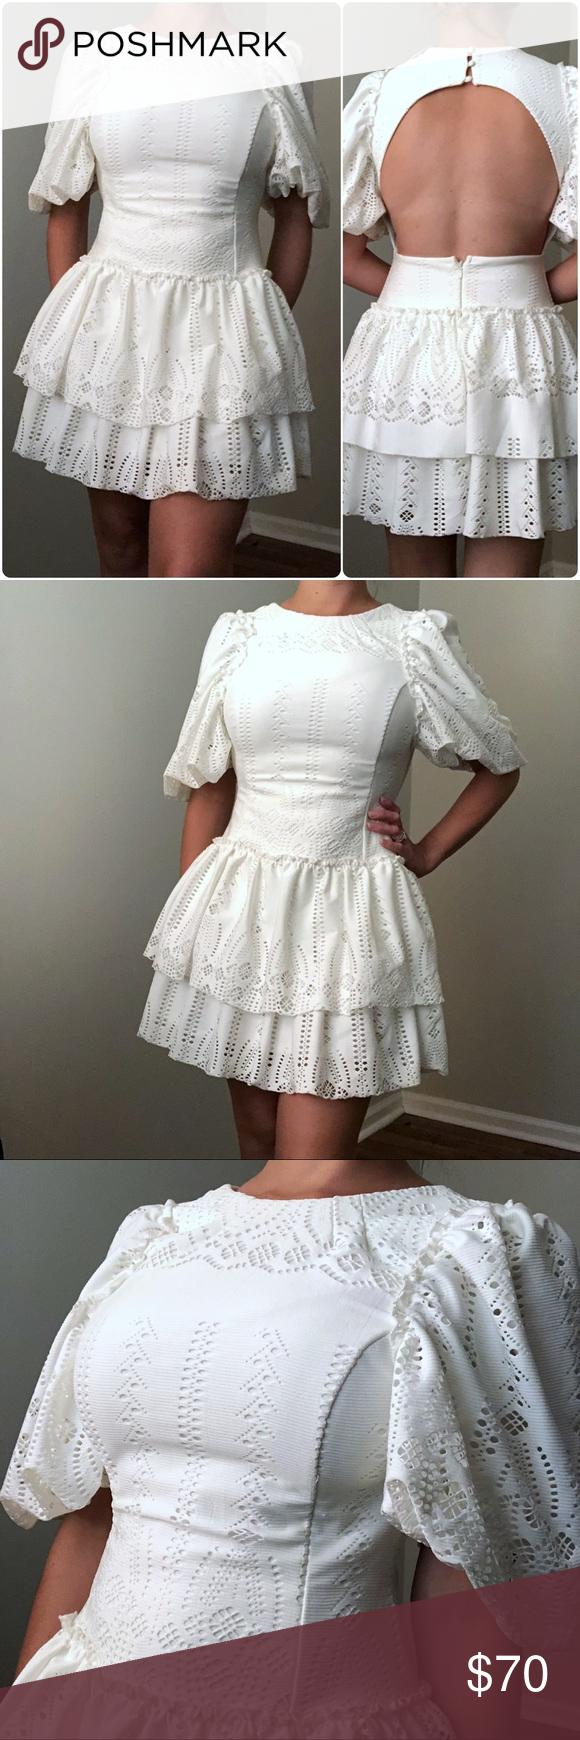 Asos White Open Back Tiered Ruffle Dress Sz 6 Nwt Tiered Ruffle Dress Dresses Ruffle Dress [ 1740 x 580 Pixel ]